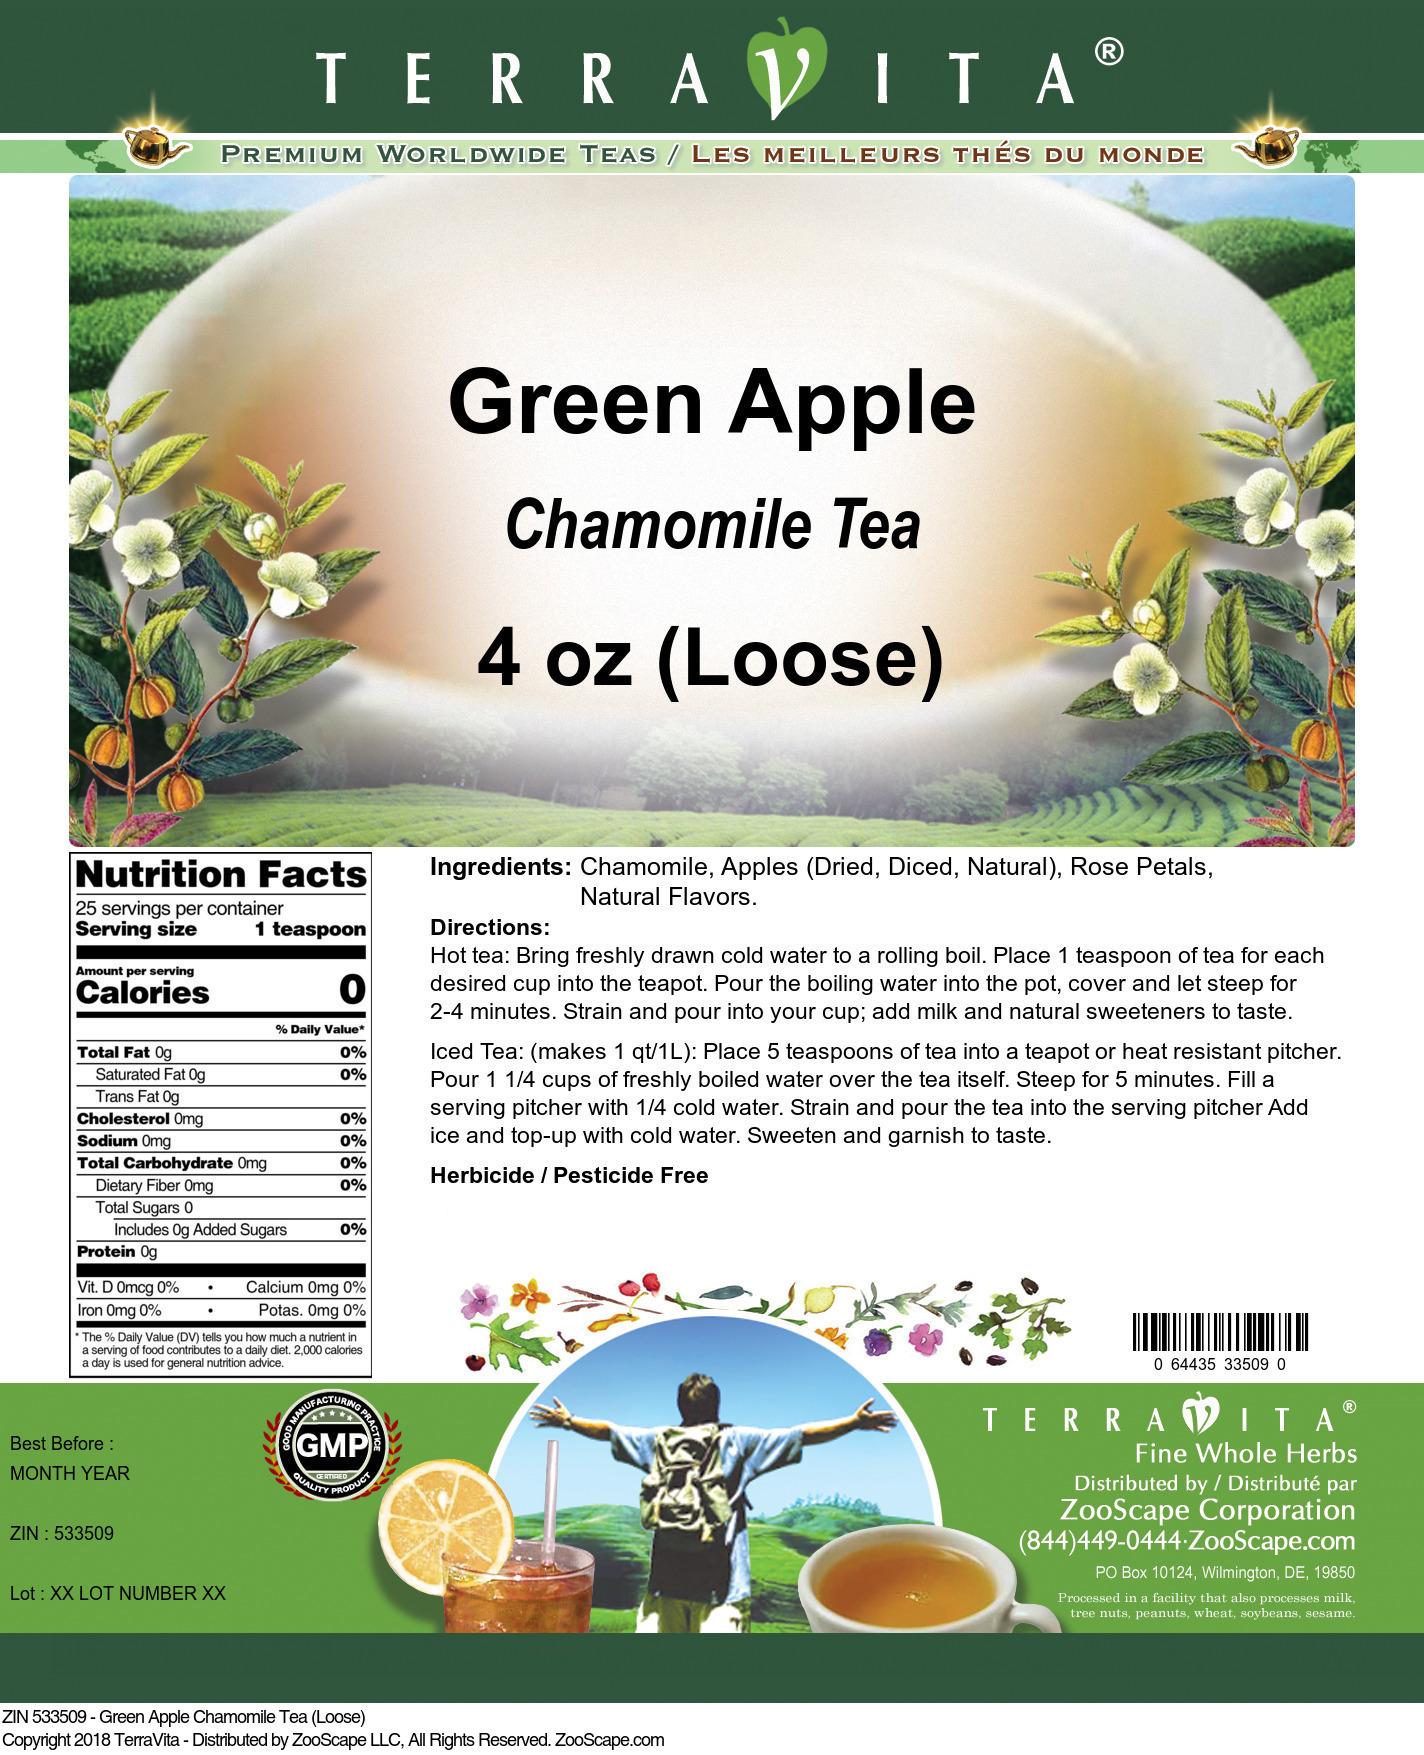 Green Apple Chamomile Tea (Loose)